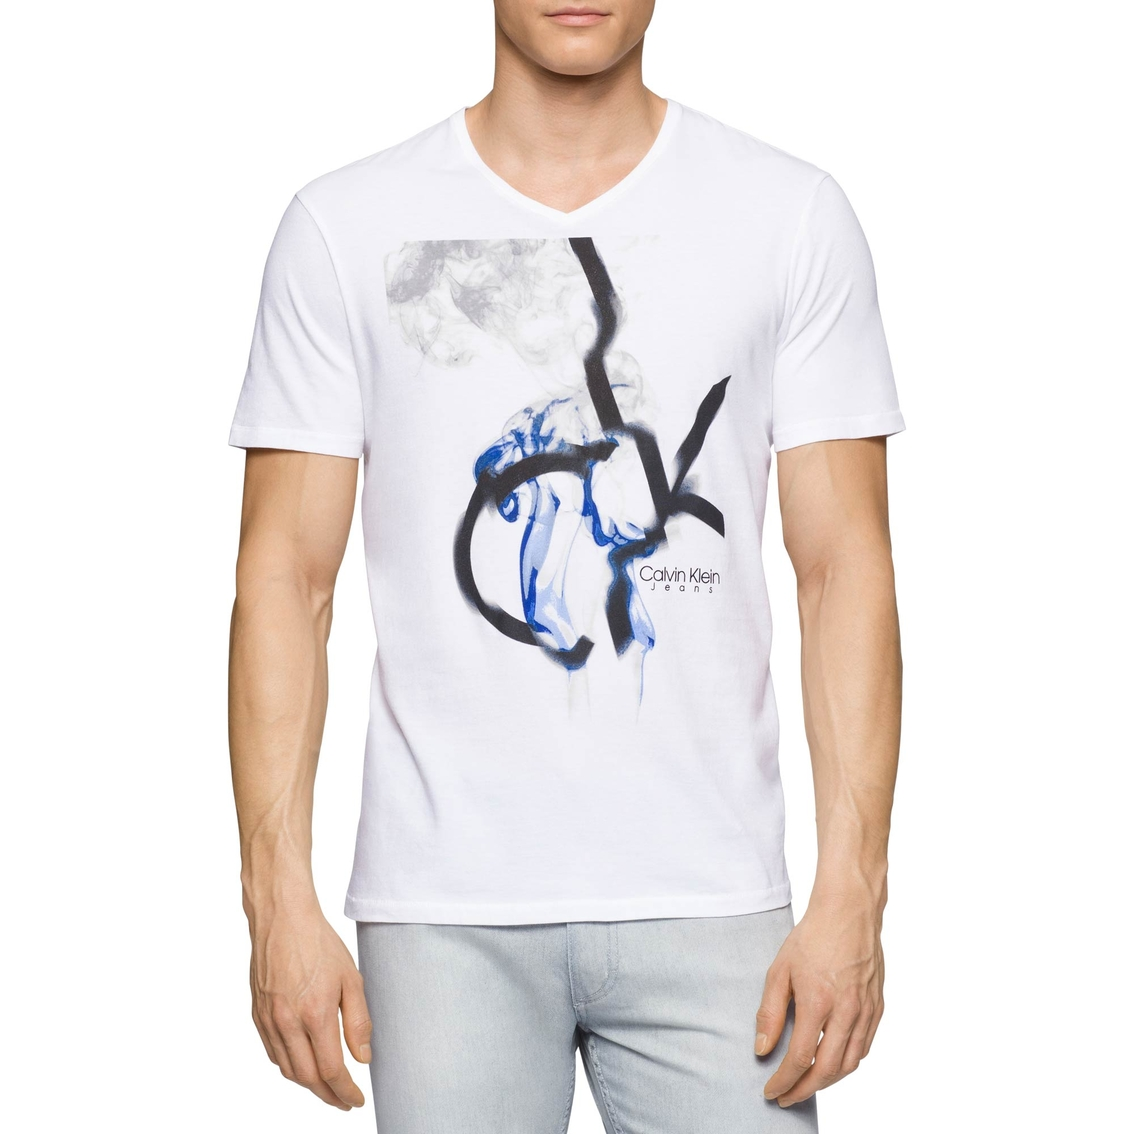 ufficiale migliori offerte su salvare Calvin Klein Jeans Smoking Ck V Neck Tee | T-shirts | Clothing ...